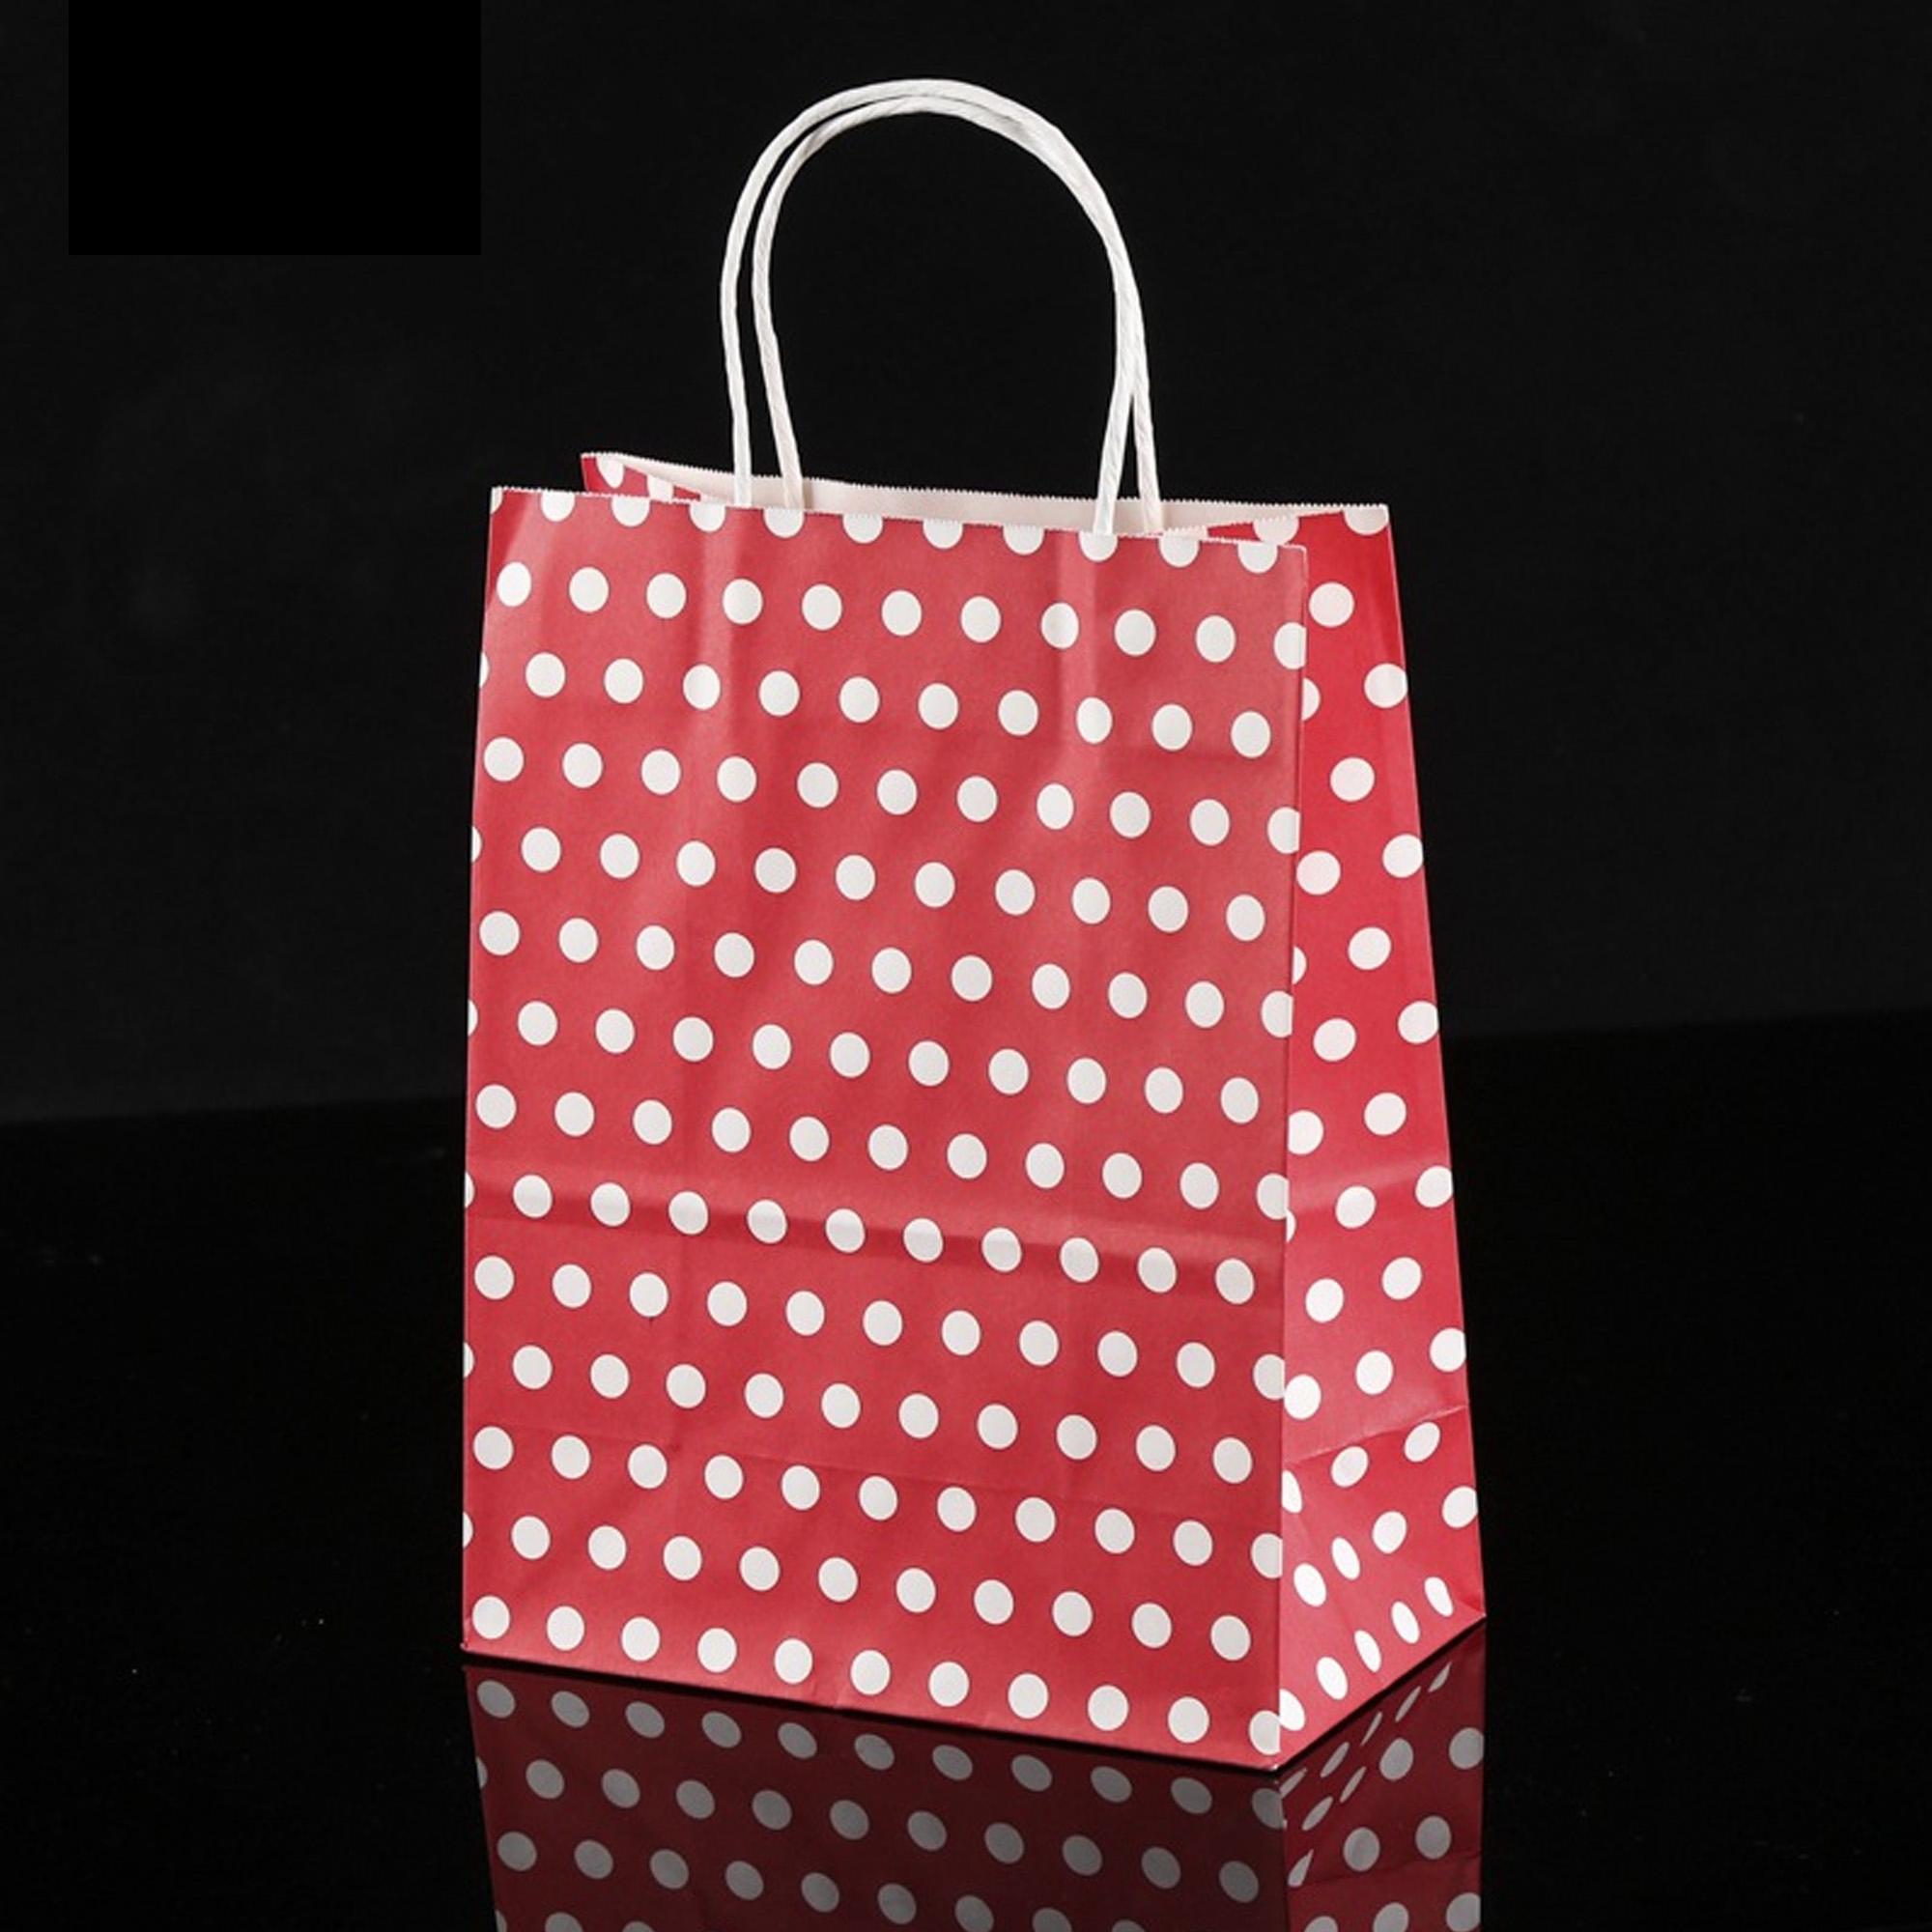 8 27x4 33x10 63in Red Polka Dot Paper Kraft Christmas Gift Ping Bag 12pcs